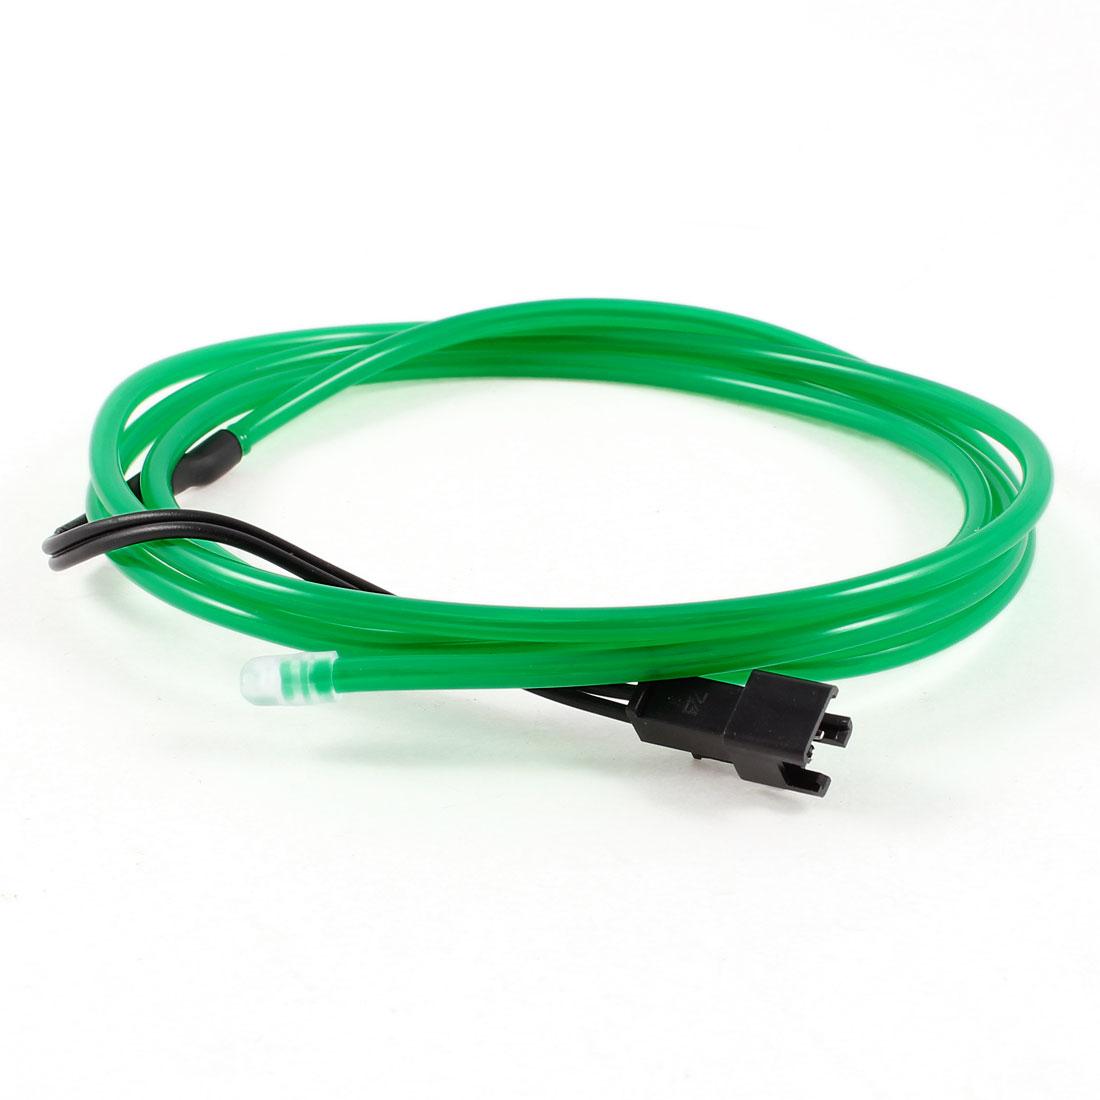 1M Long 3.2mm Dia Green Light Flexible EL Wire Neon Glow Strip Rope